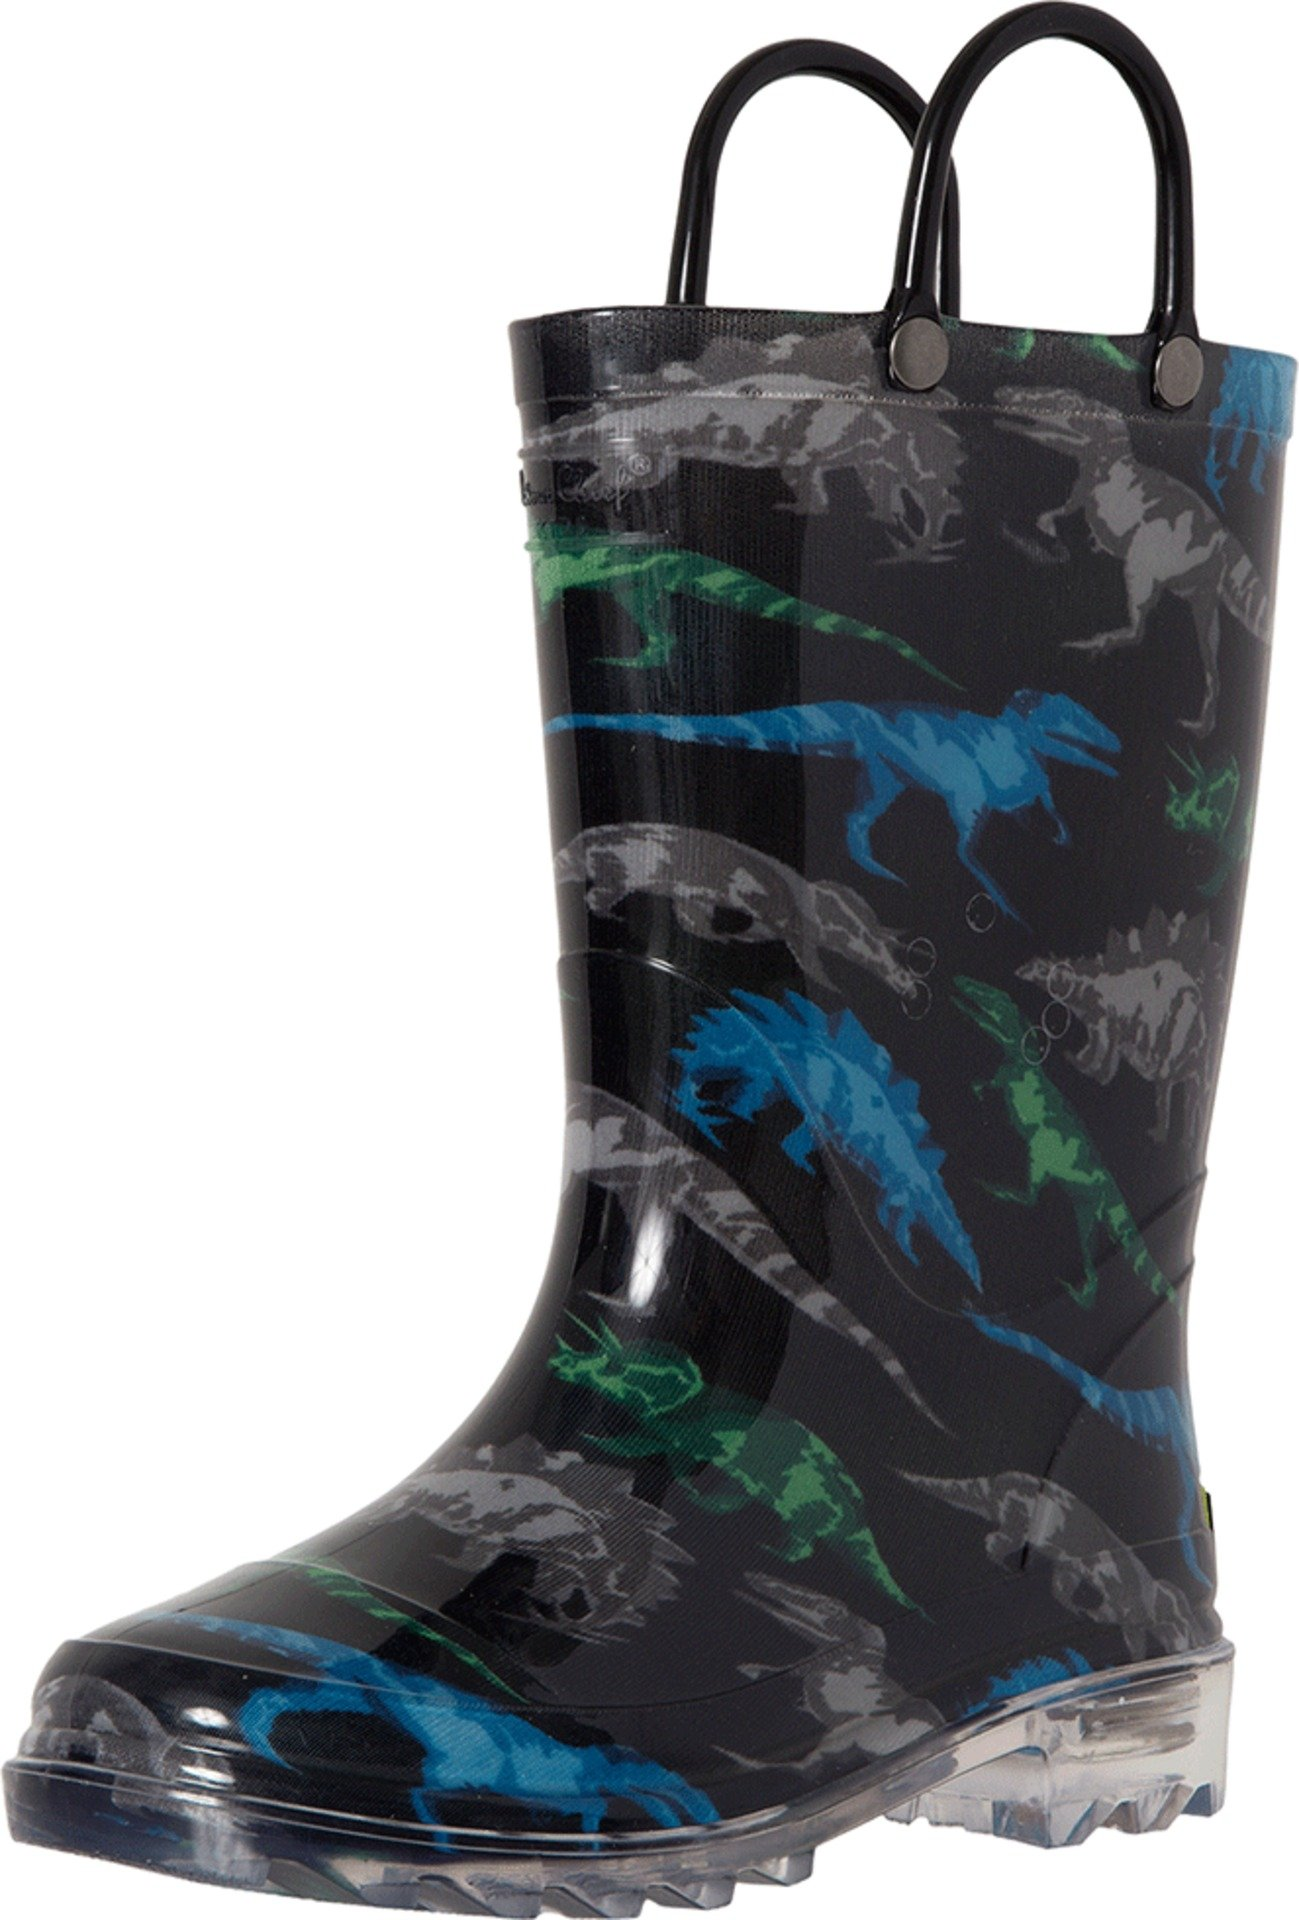 Western Chief Boys' Light-up Waterproof Rain Boot, Dinosaur Friends, 1 M US Little Kid by Western Chief (Image #1)